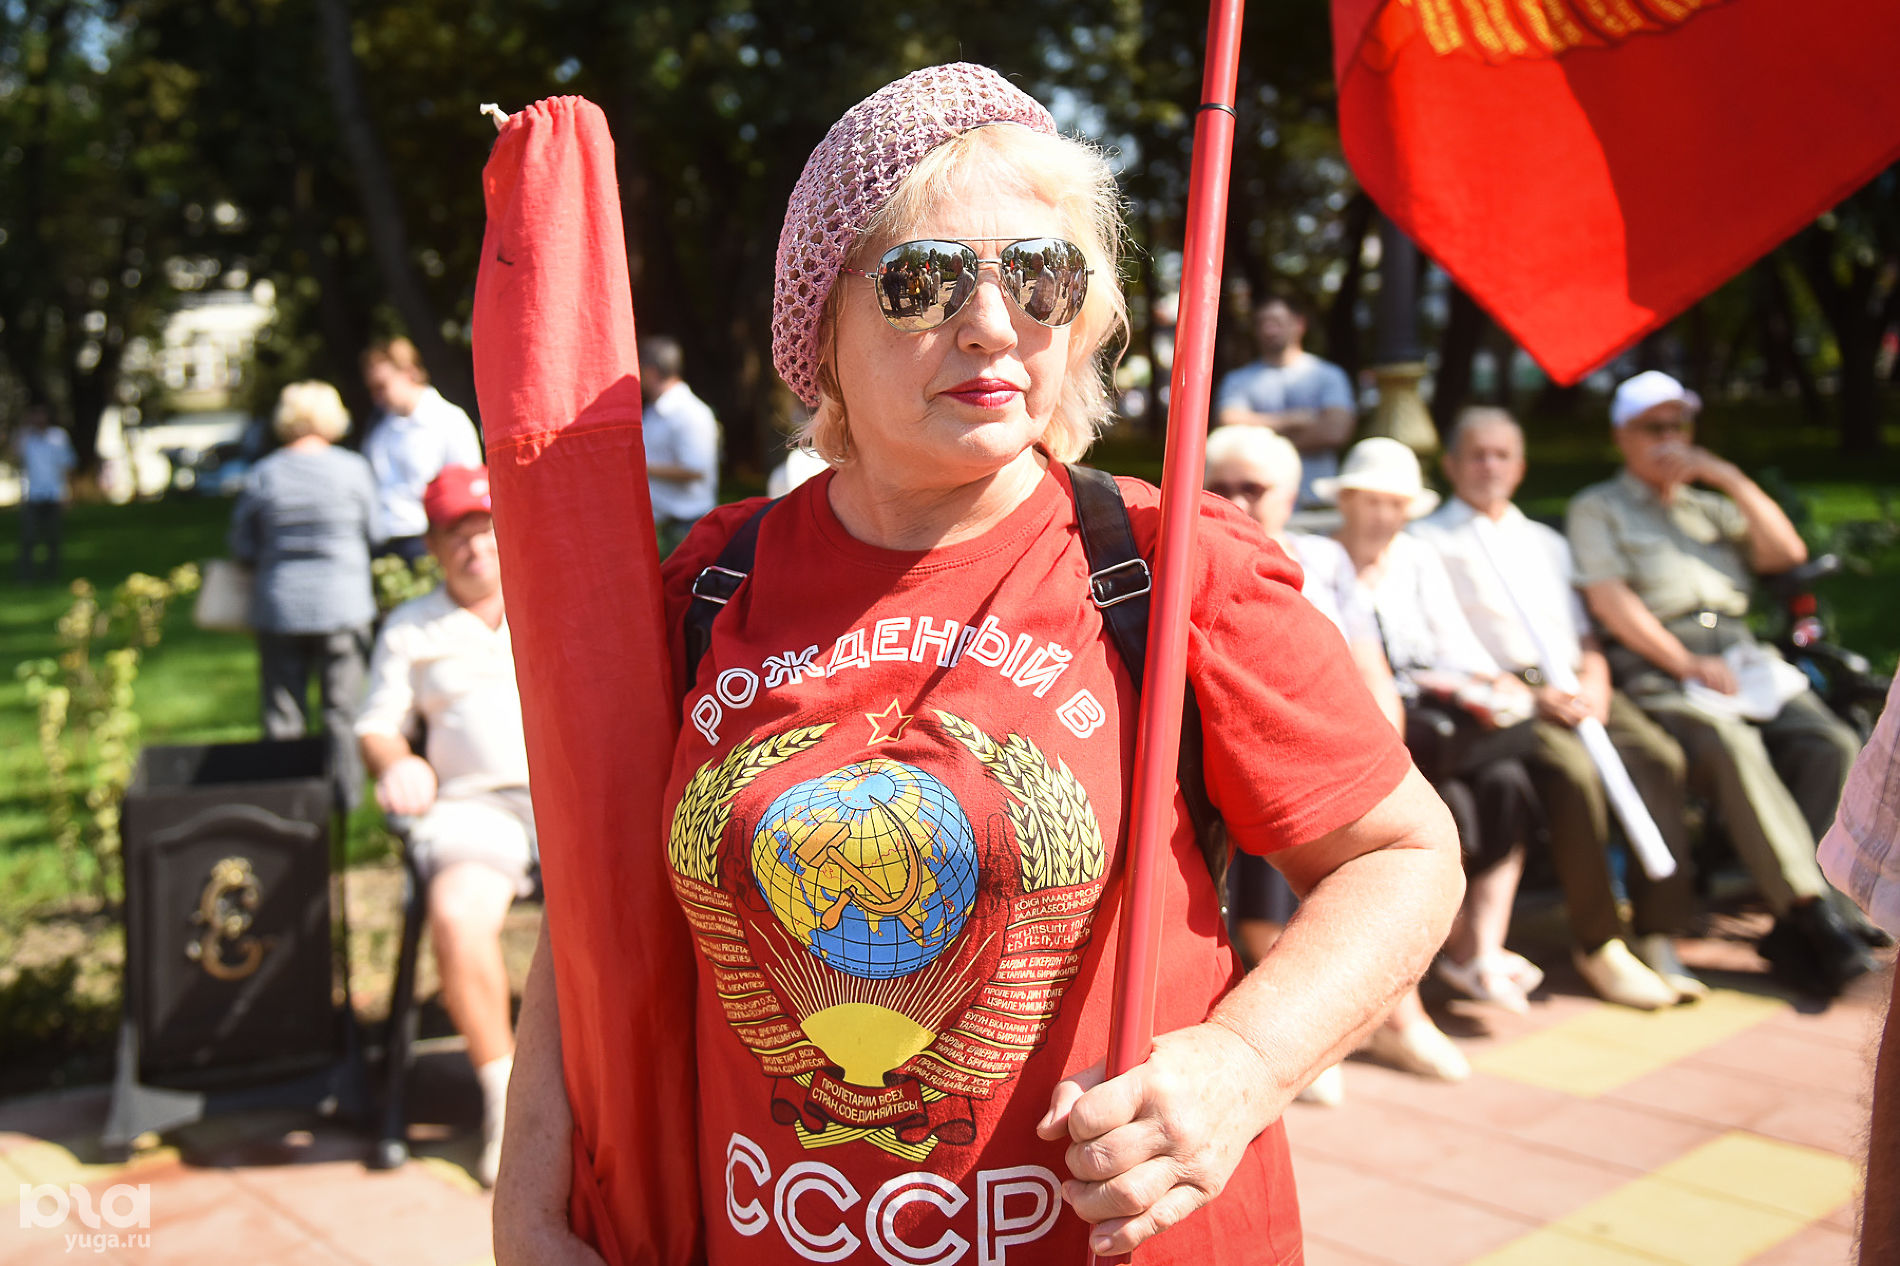 Тамара Орлова ©Фото Елены Синеок, Юга.ру